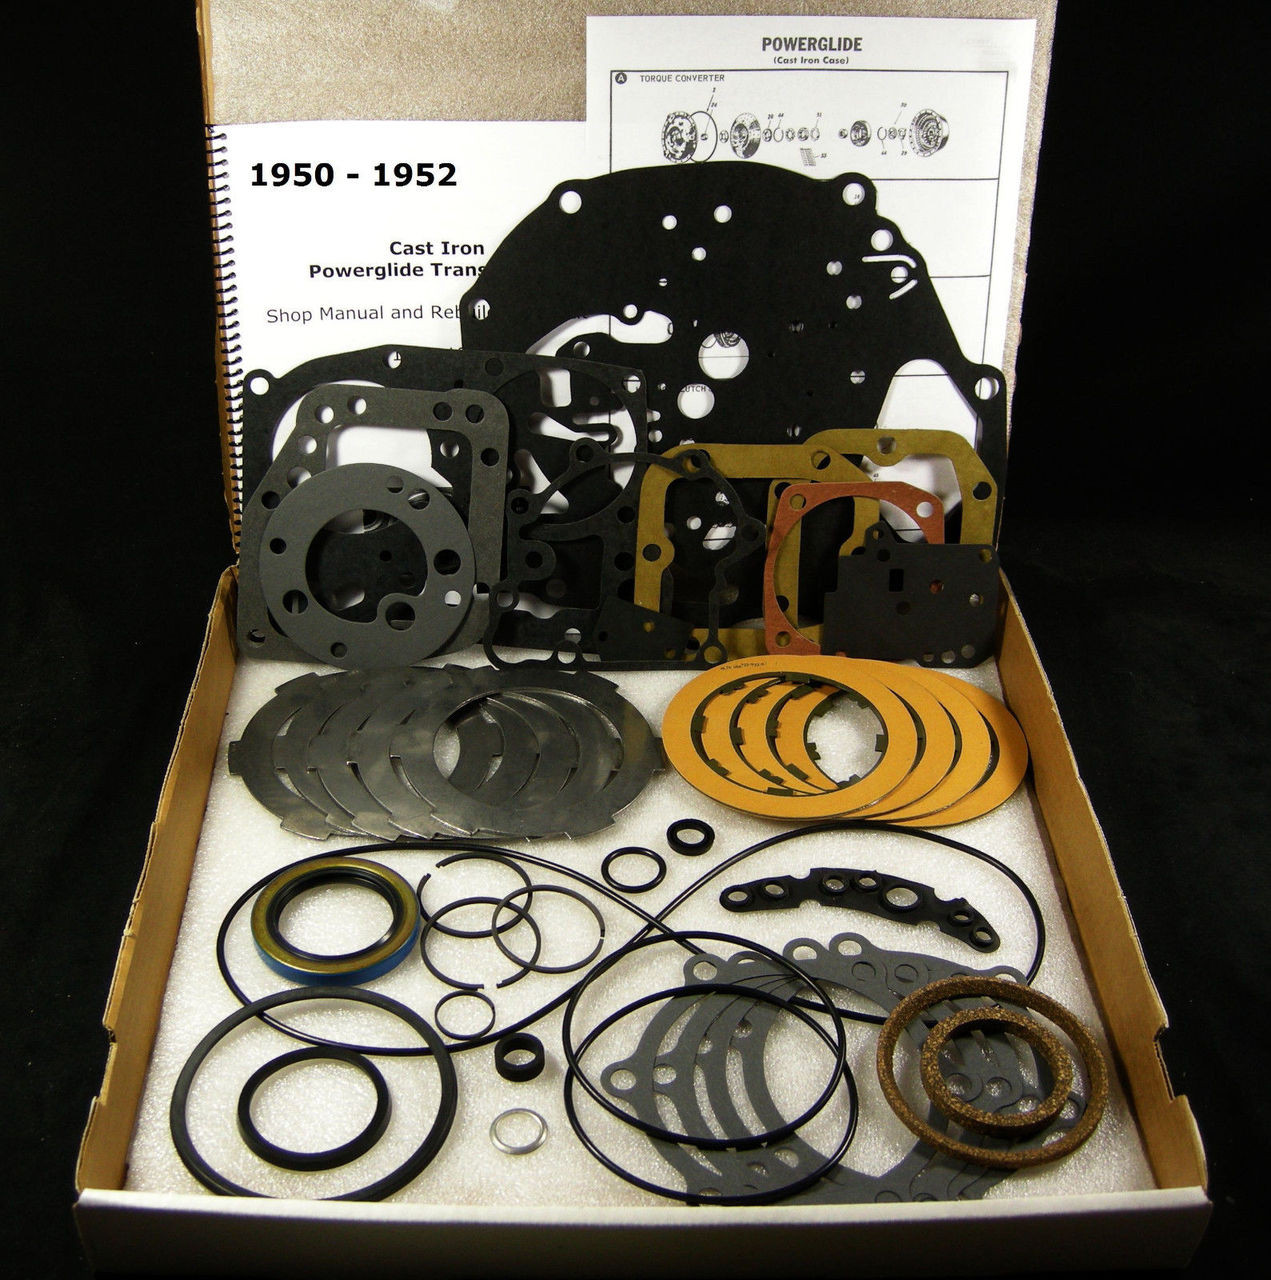 hight resolution of 950 52 cast iron powerglide transmission rebuild overhaul part kit